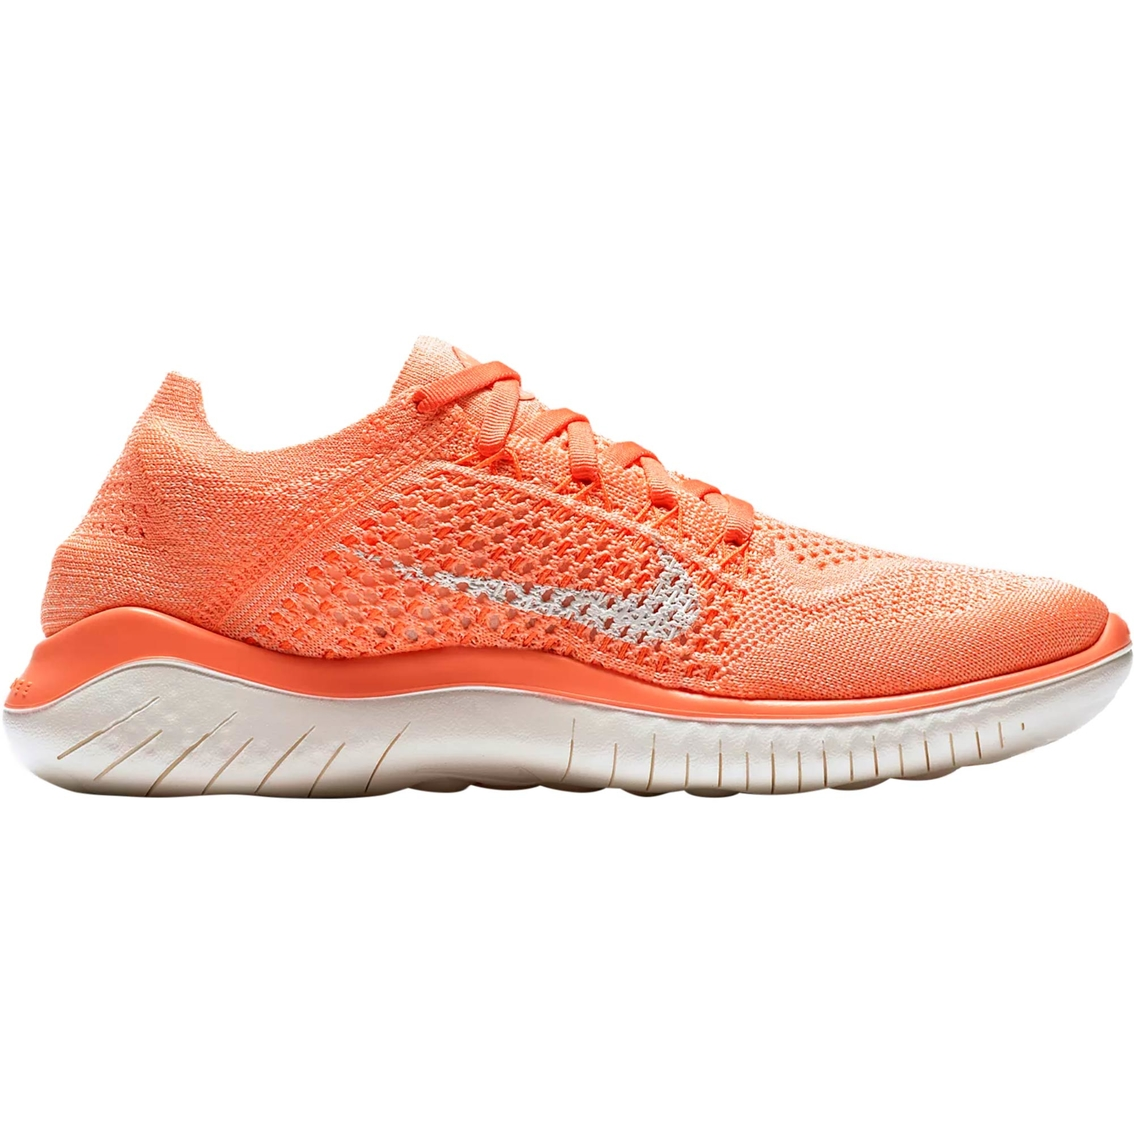 f2bf584c966 Nike Women s Free Rn Flyknit 2018 Running Shoes